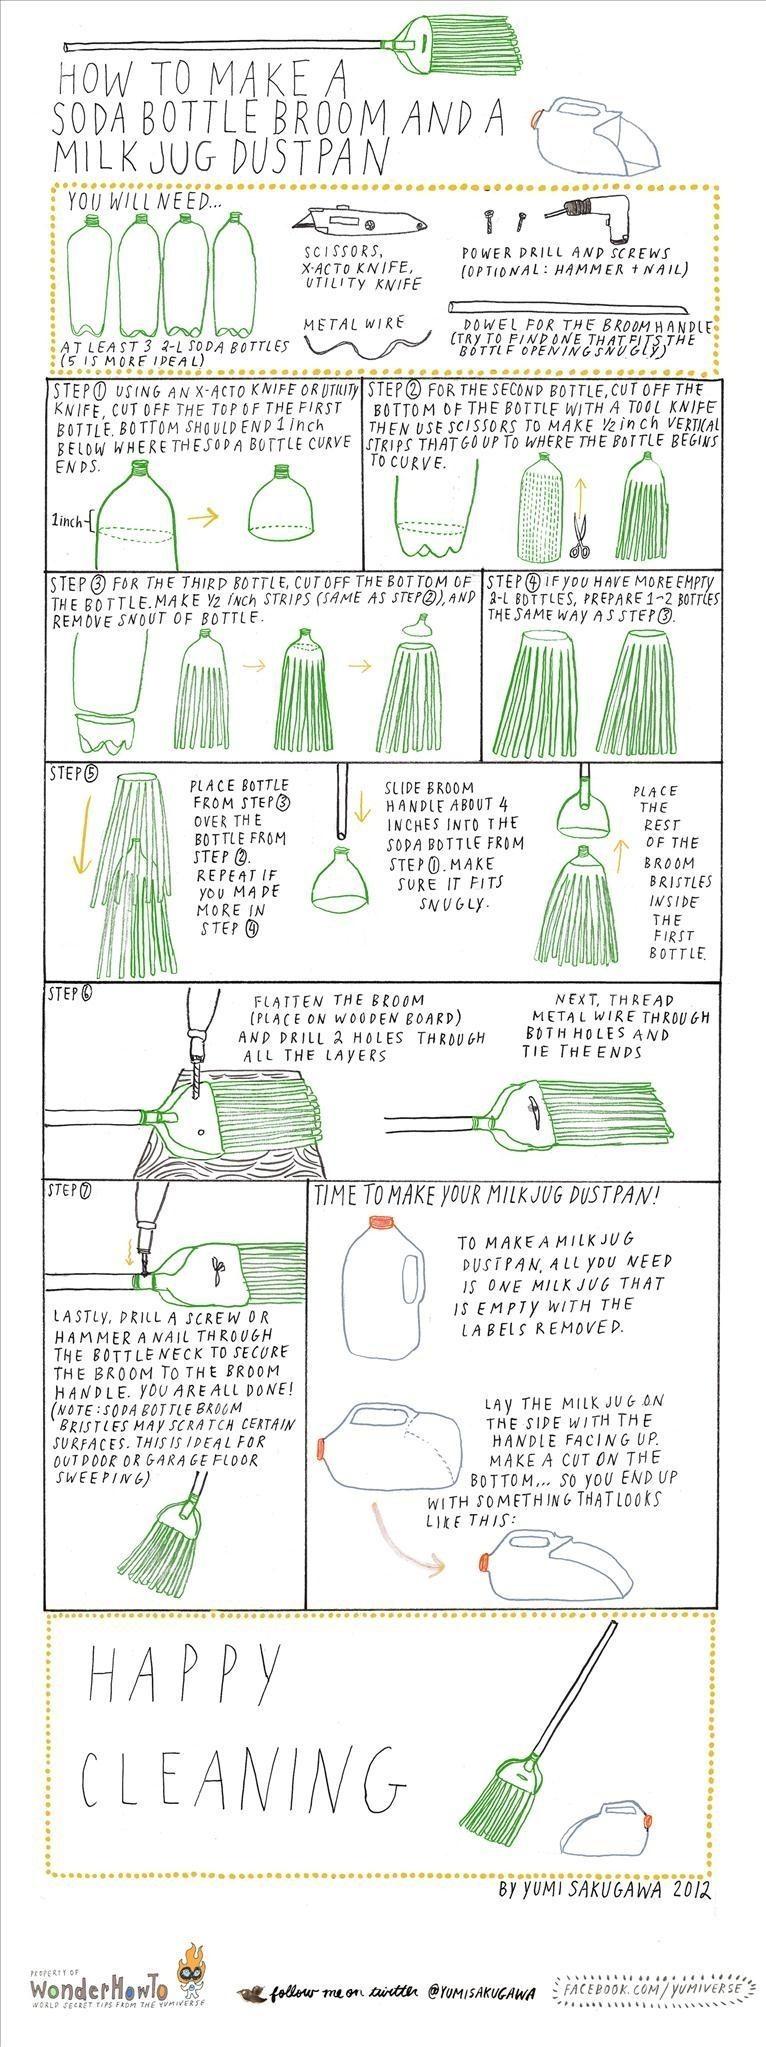 How to Make a Soda Bottle Broom and Milk Jug Dustpan